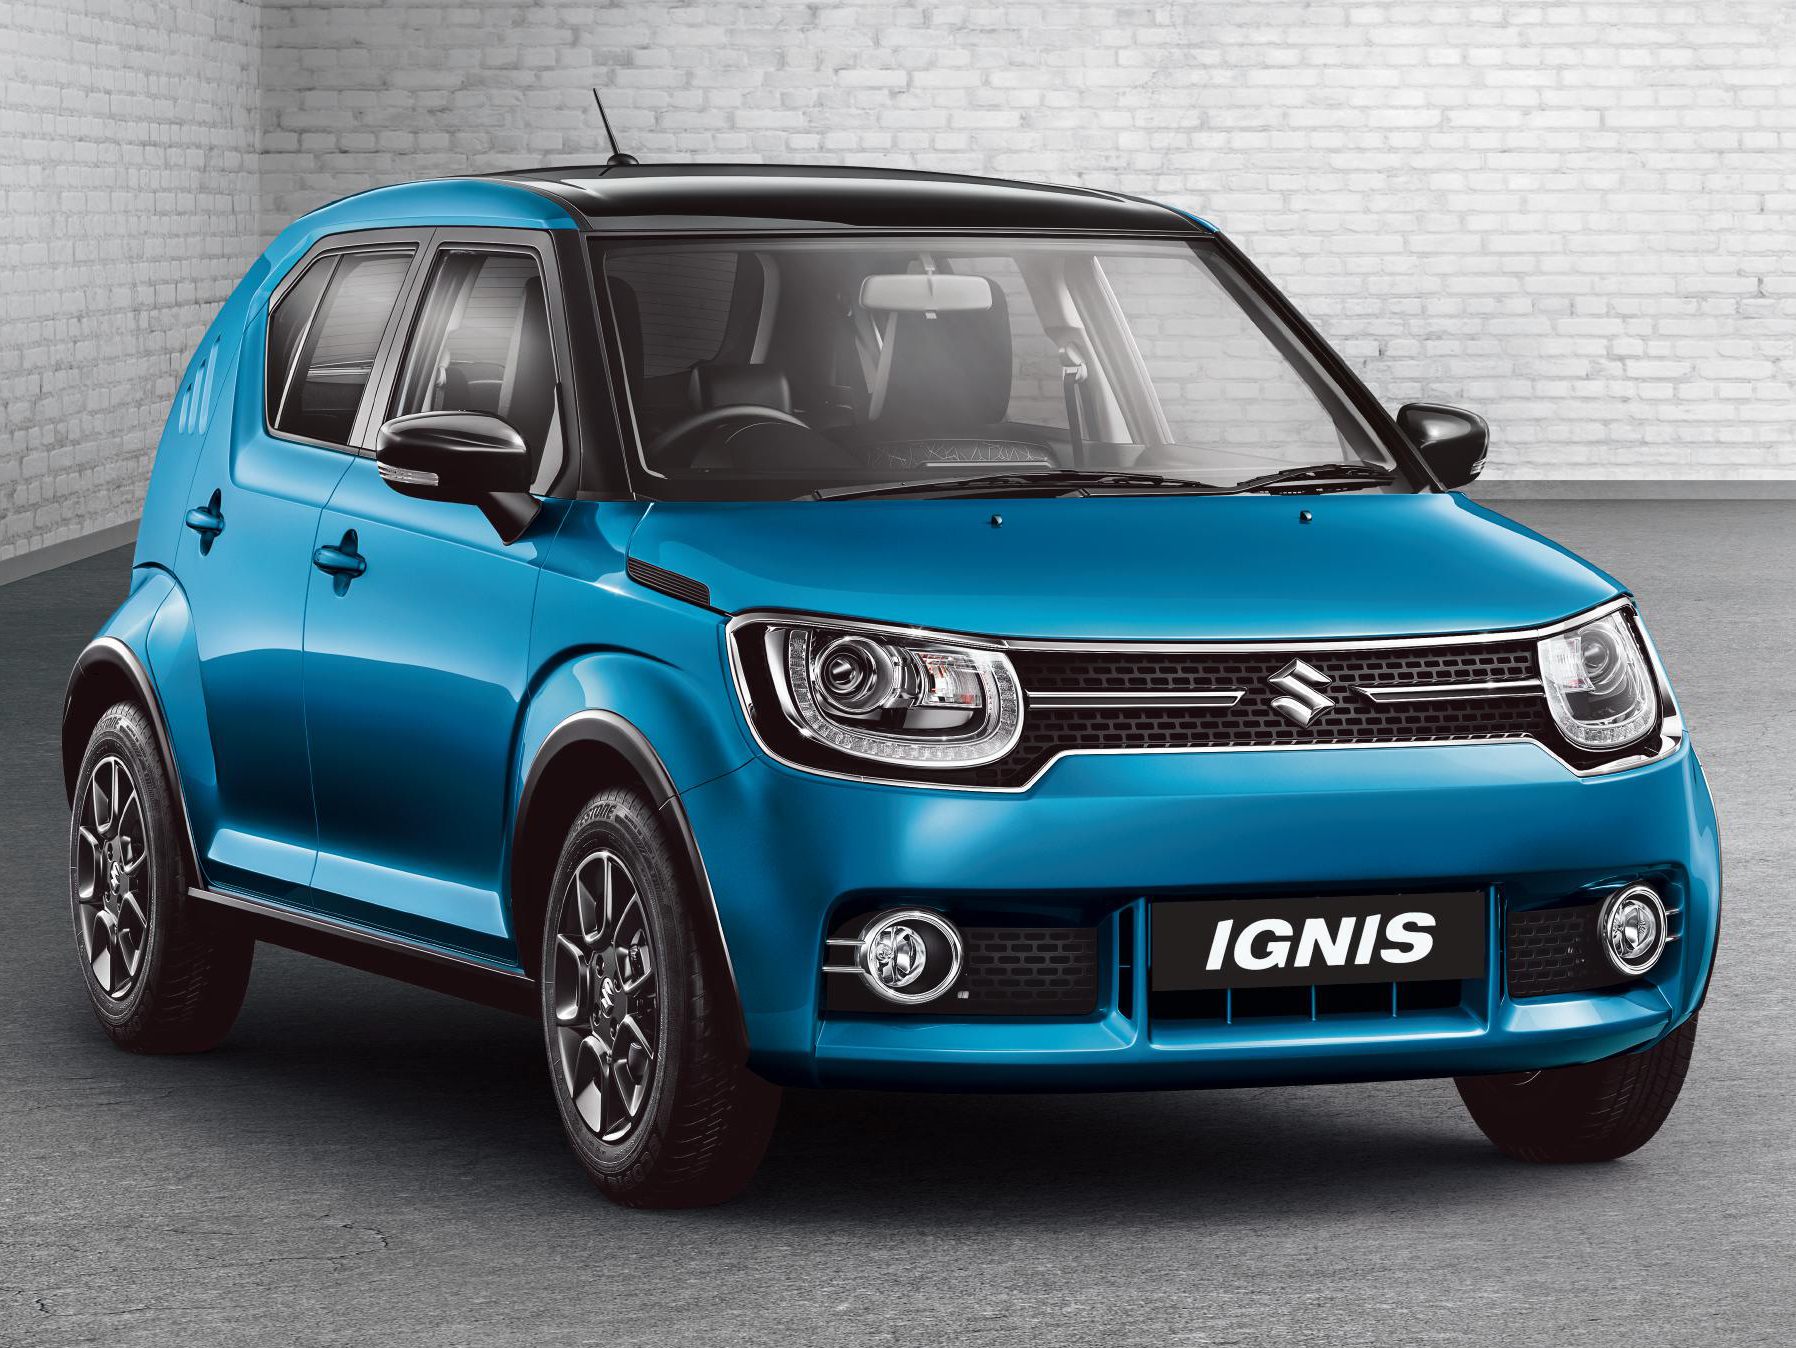 Maruti Suzuki Ignis Suzuki, Hatchback, Product launch